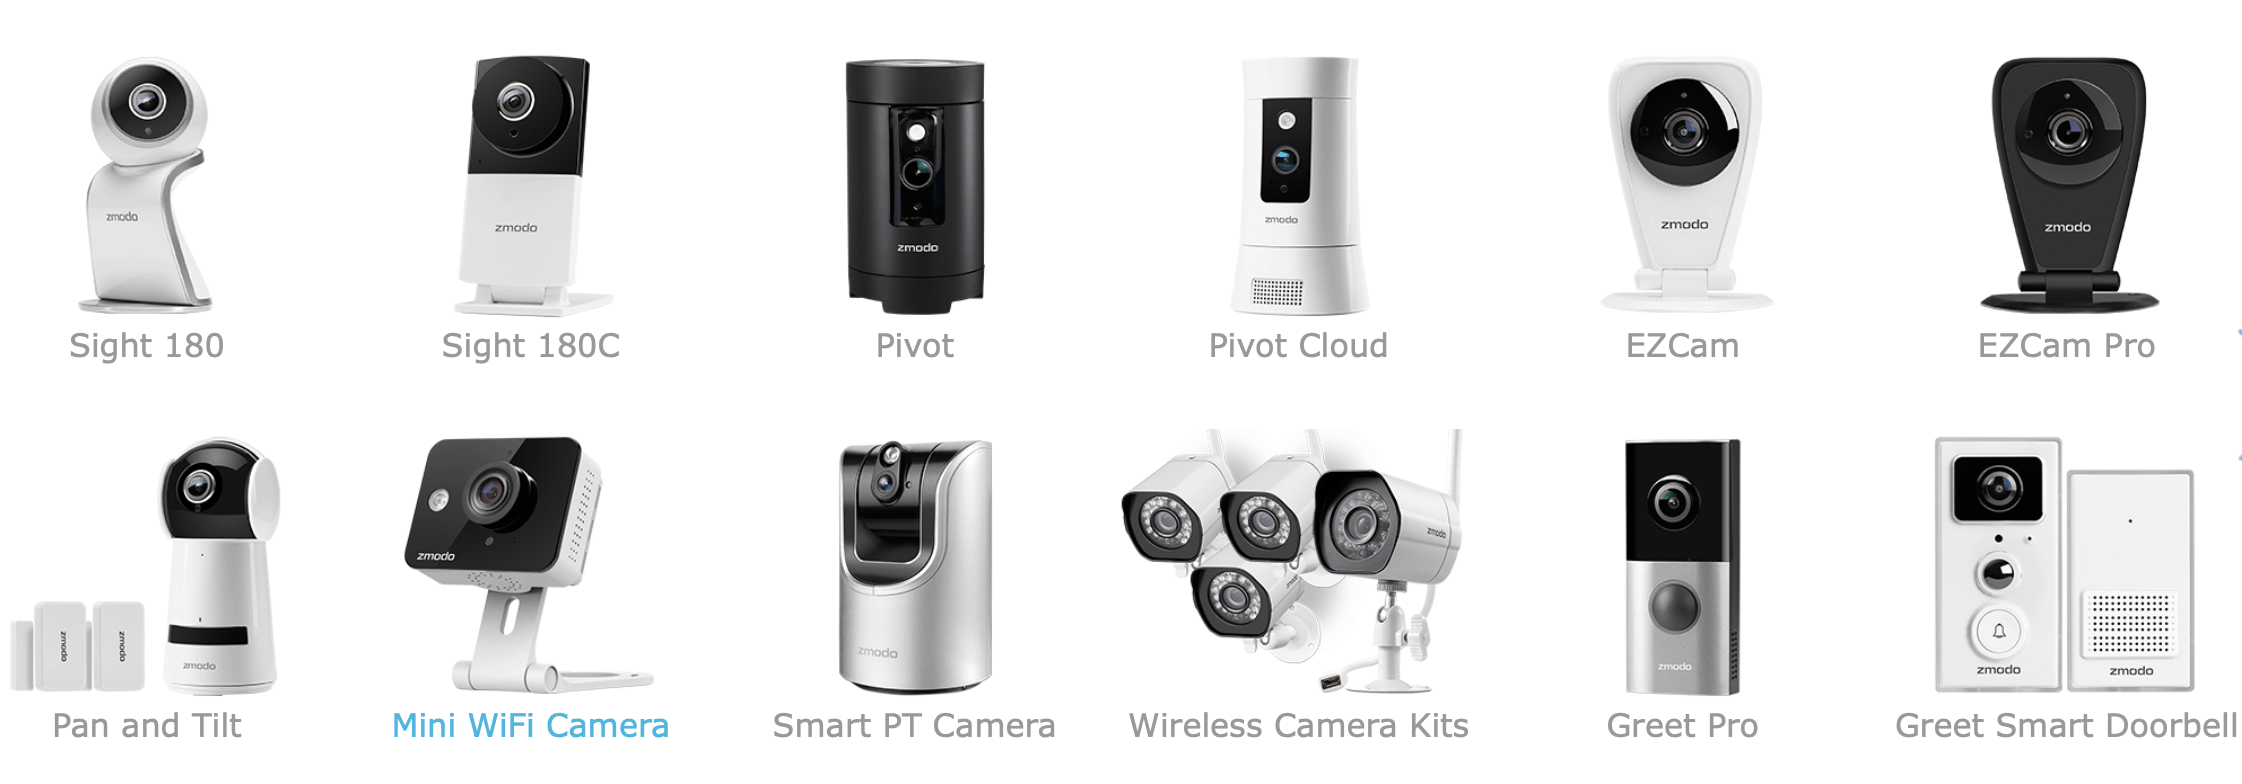 Zmodo Camera Options